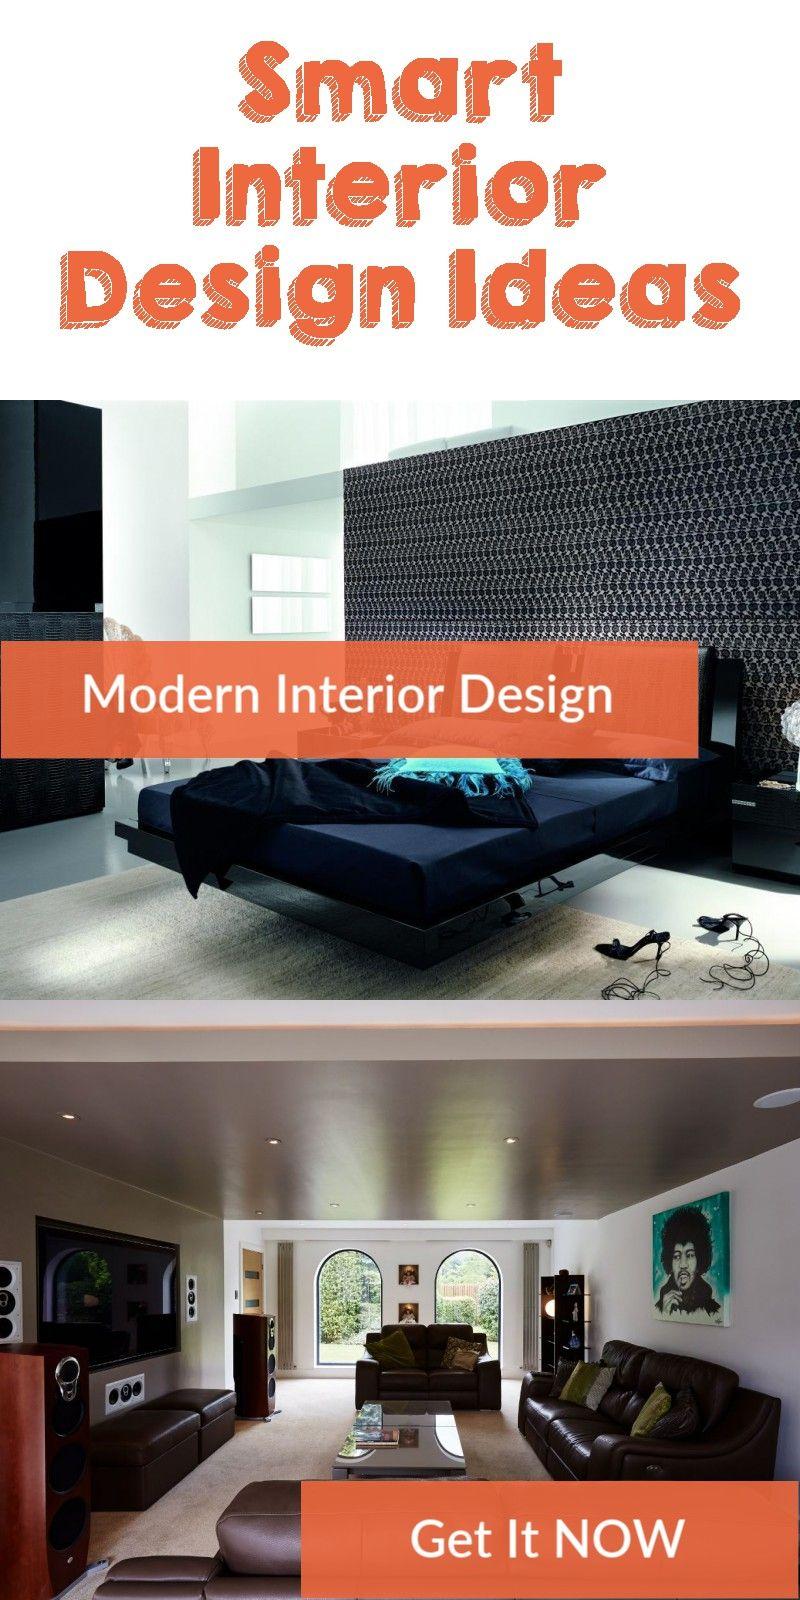 Interior Design Ideas - How You Can Be Your Own Interior Designer ...